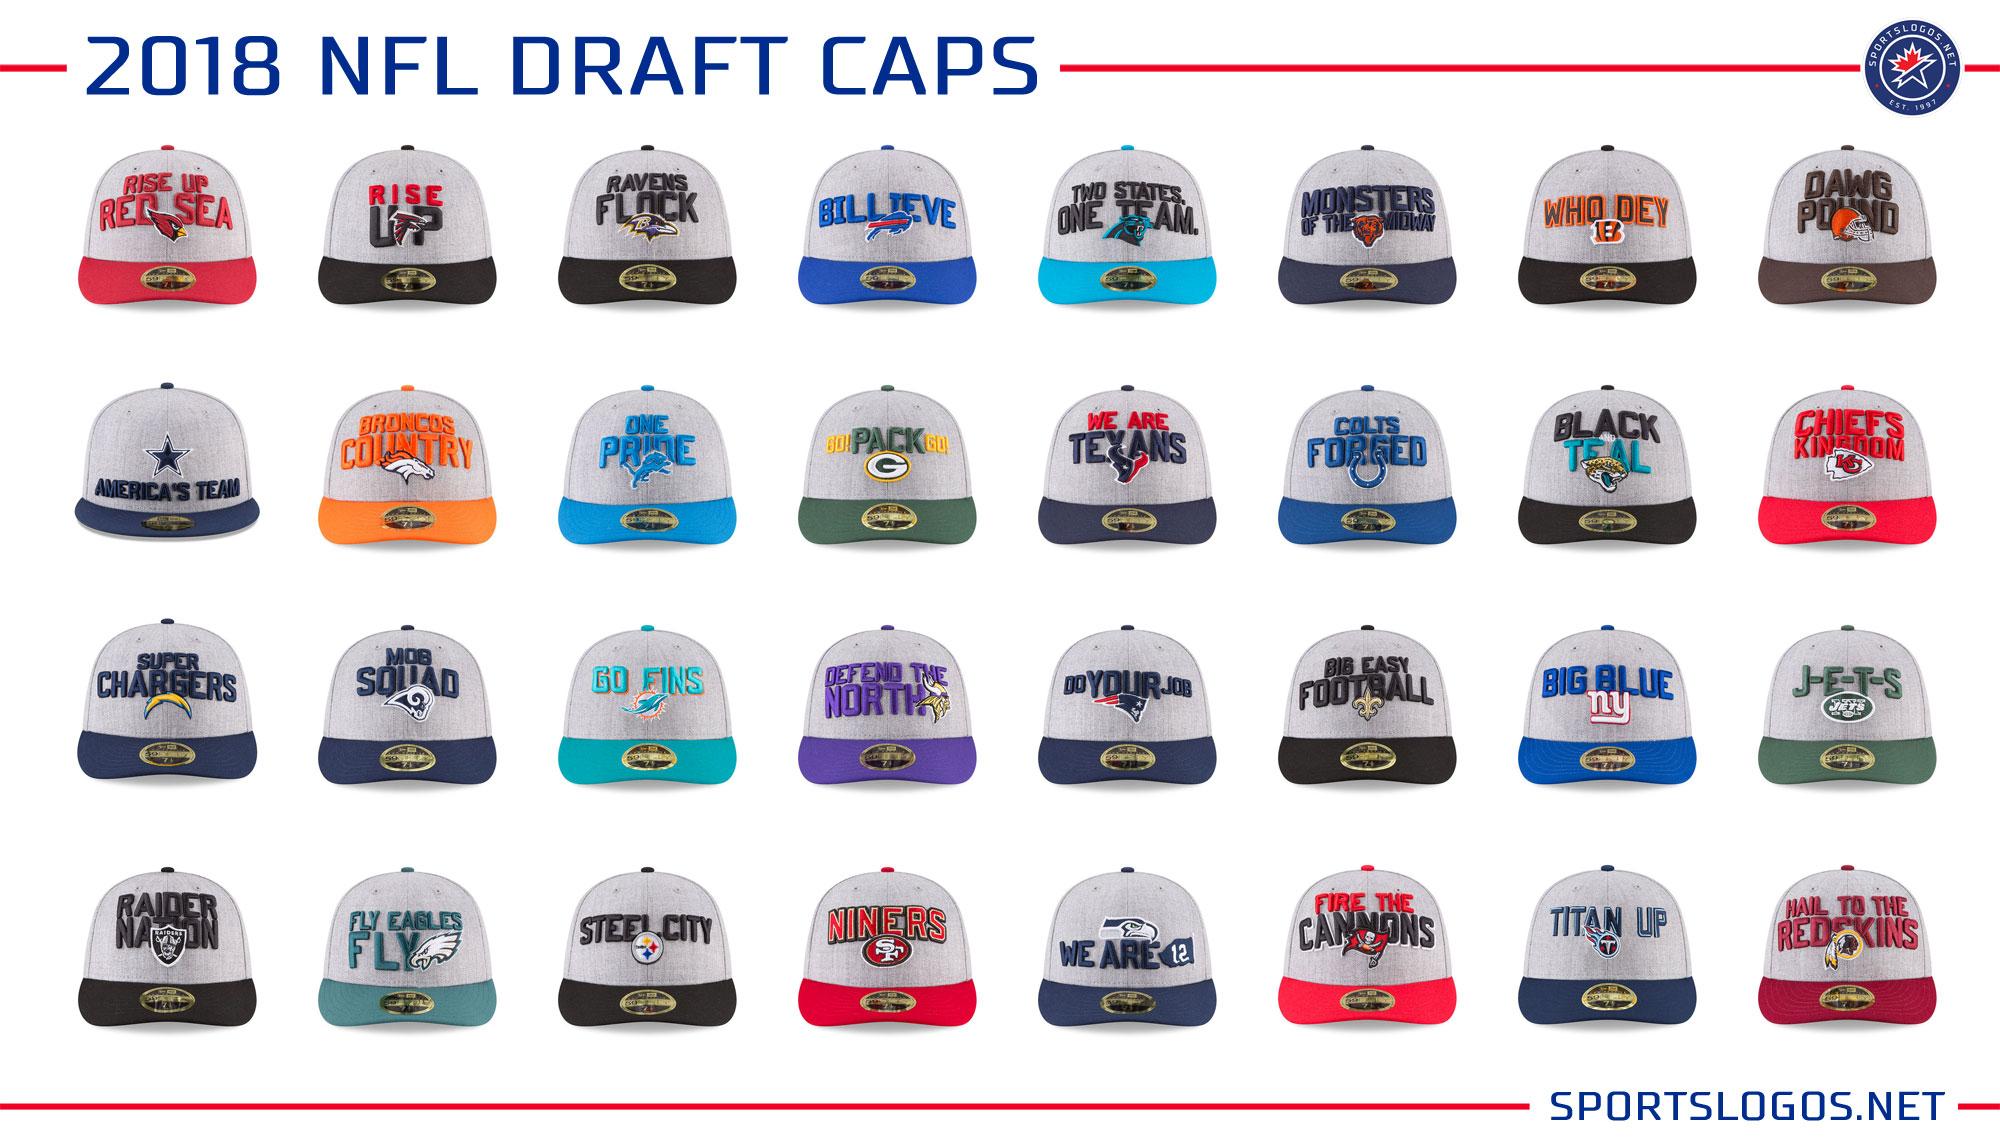 2018 NFL Draft Caps Released | Chris